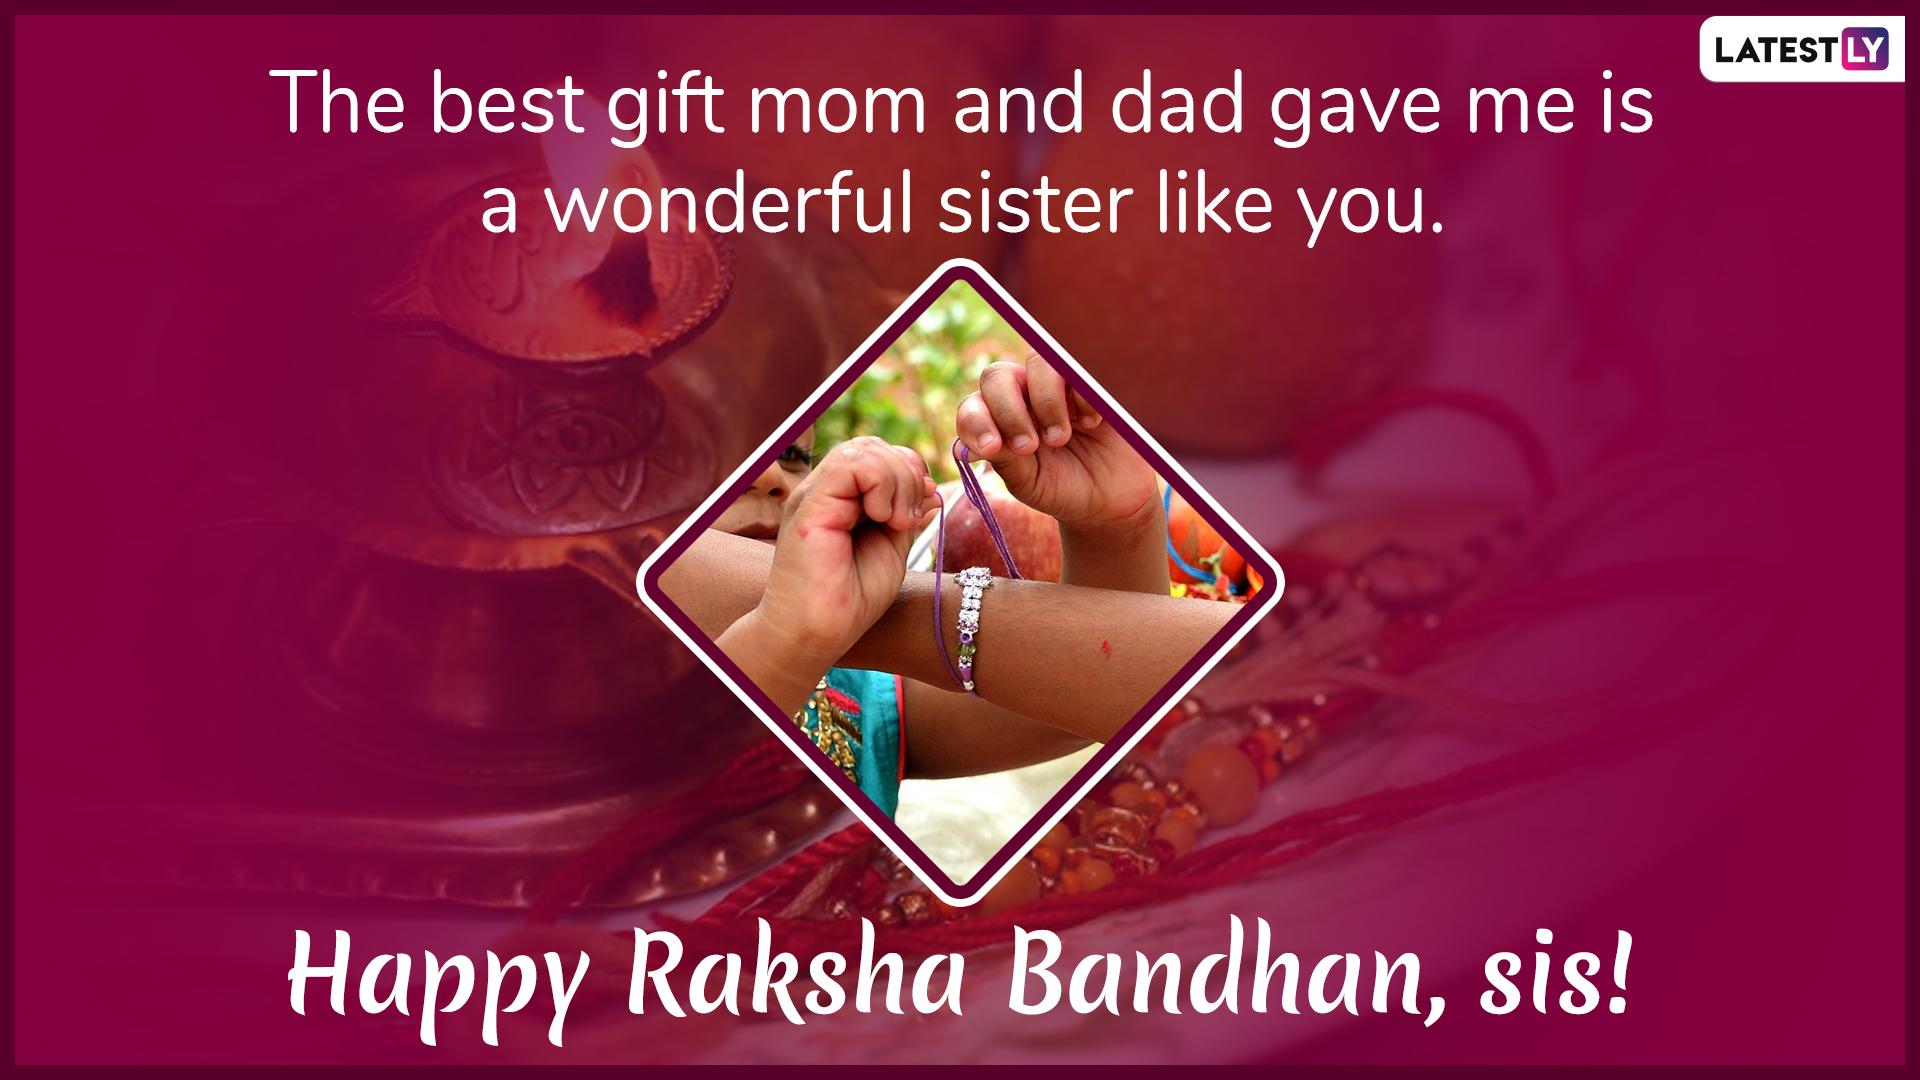 Raksha Bandhan 2019 greeting card for download 2 (Photo Credits: File Image)